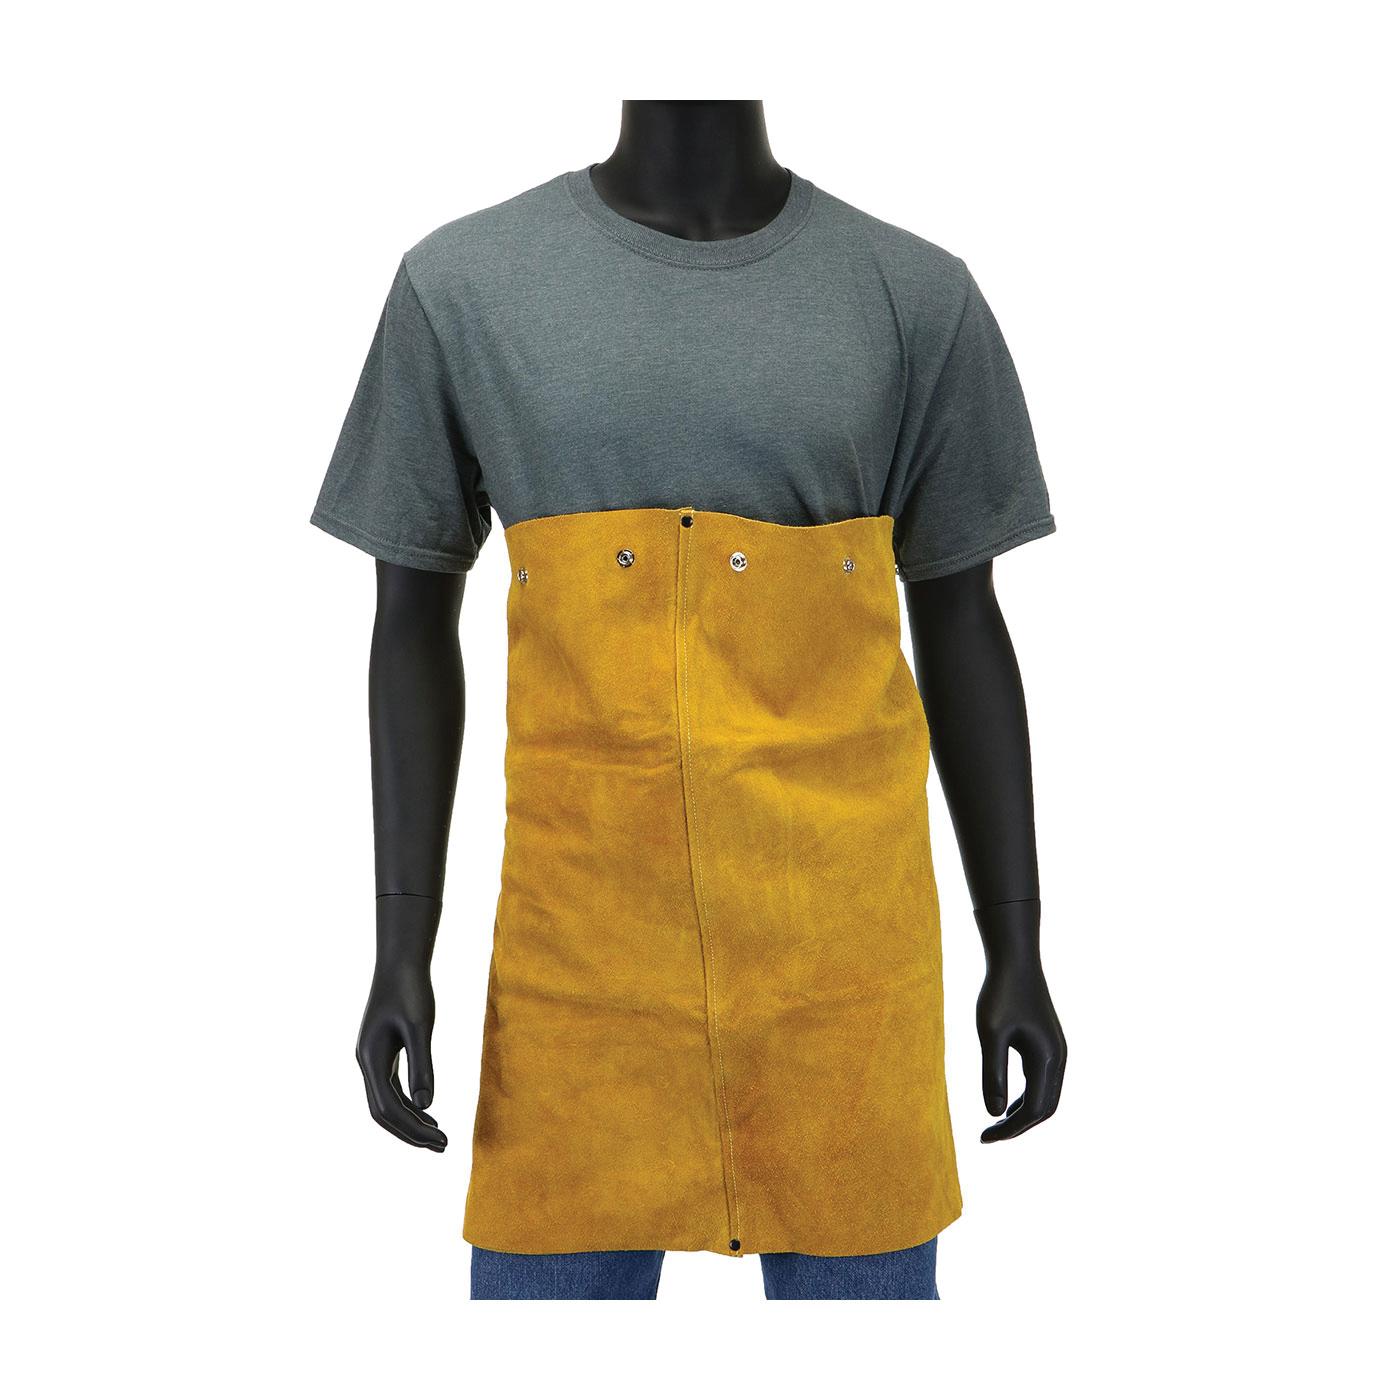 Ironcat® 7000/XL Cape Sleeve, XL, Golden Yellow, Leather, Anodized Snap Closure